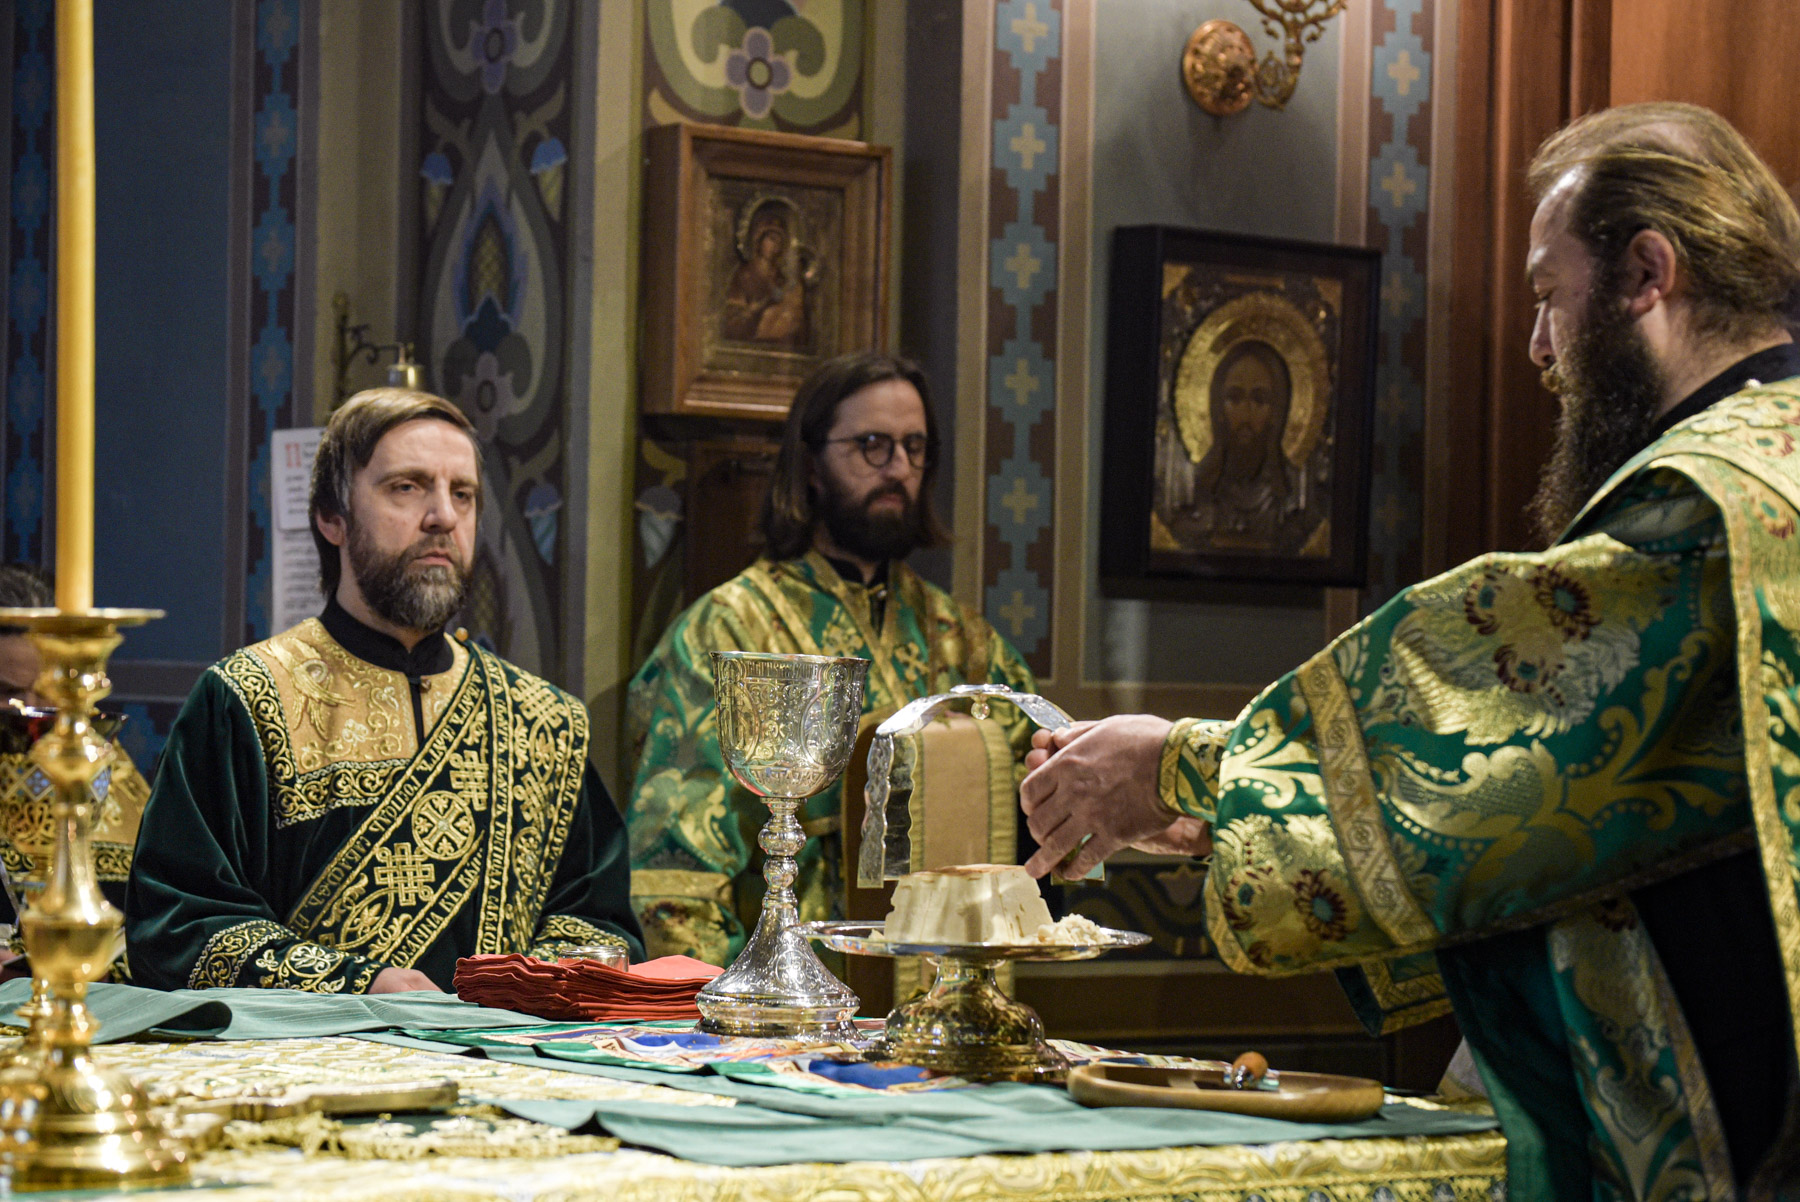 photos of orthodox christmas 0193 2